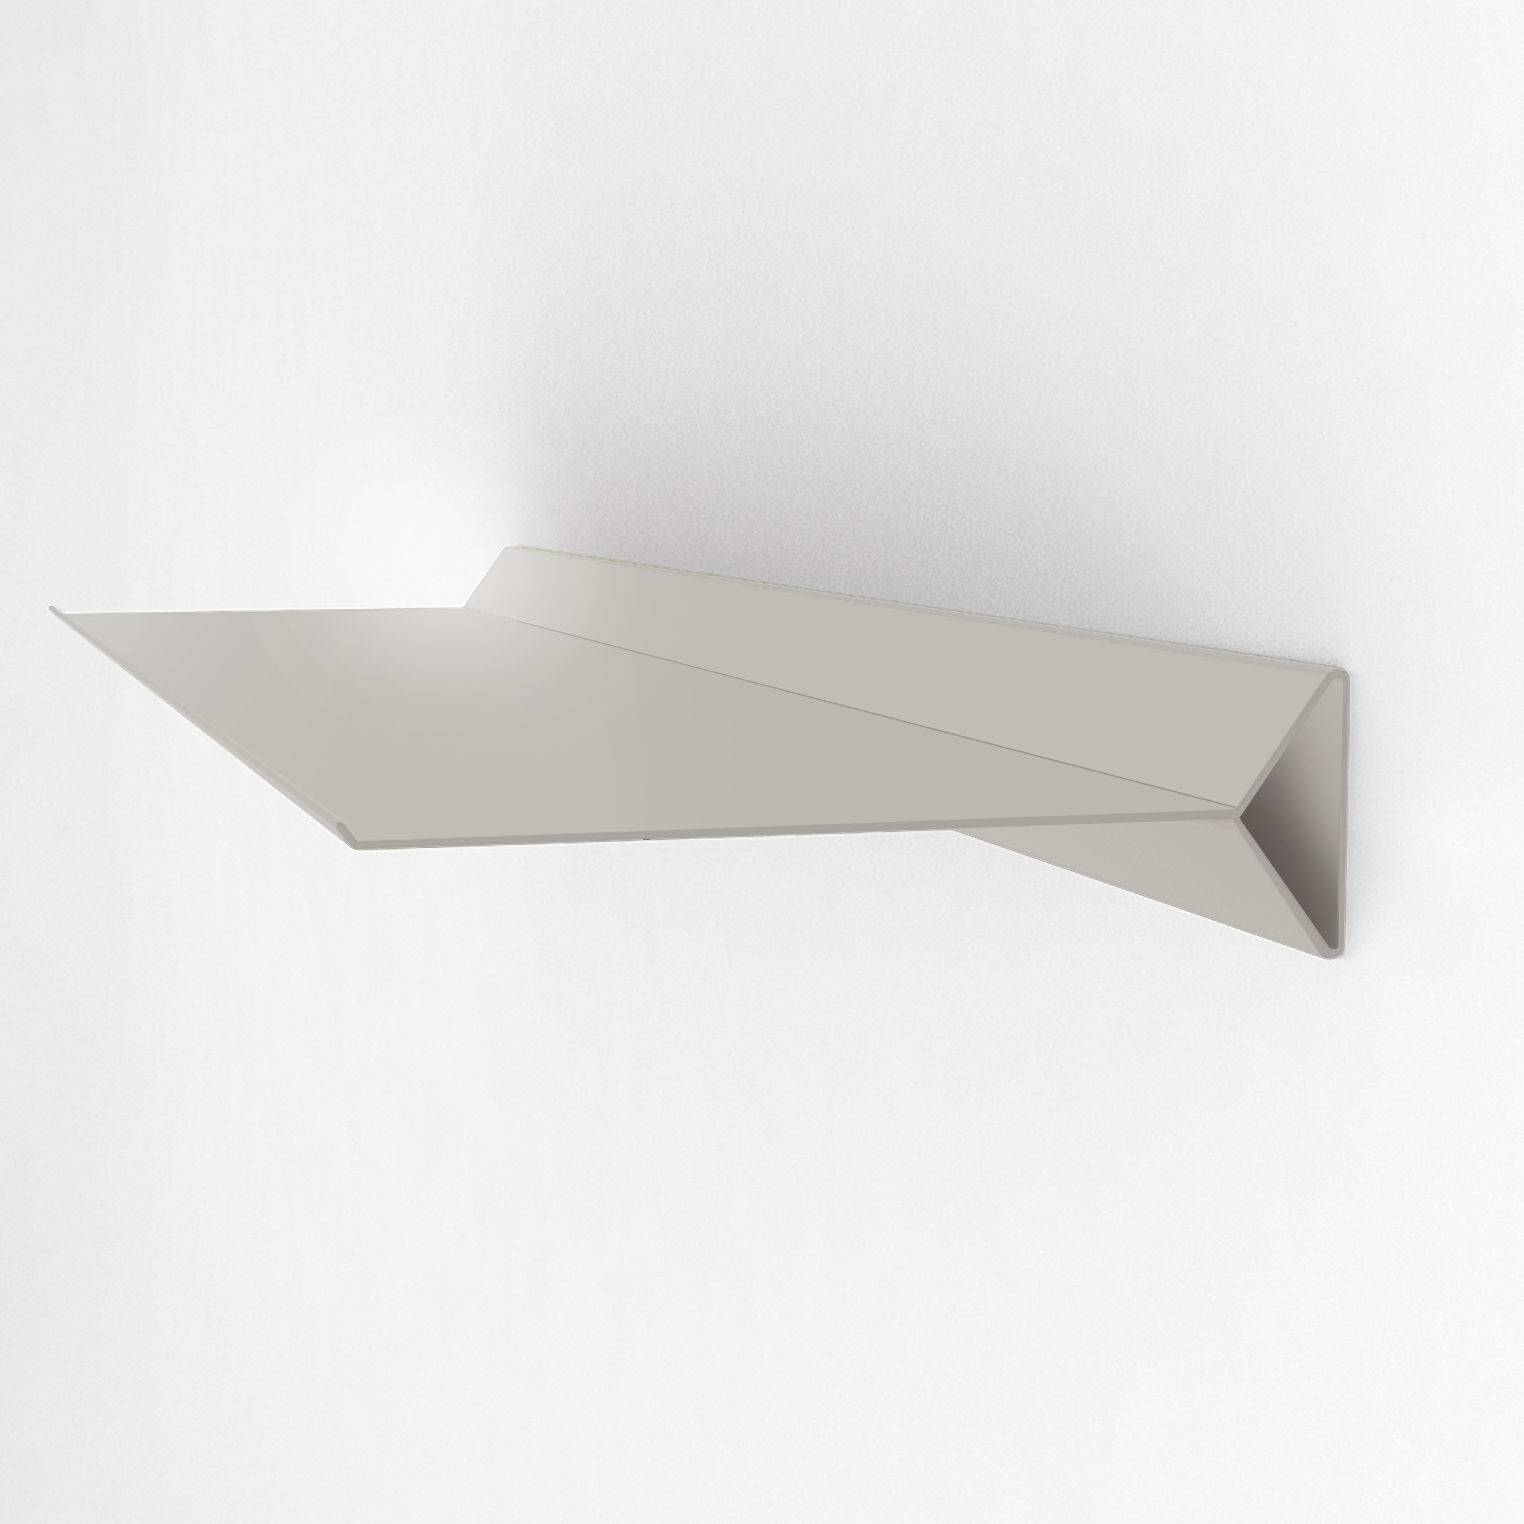 Shelf  Out of Shape | Light Grey